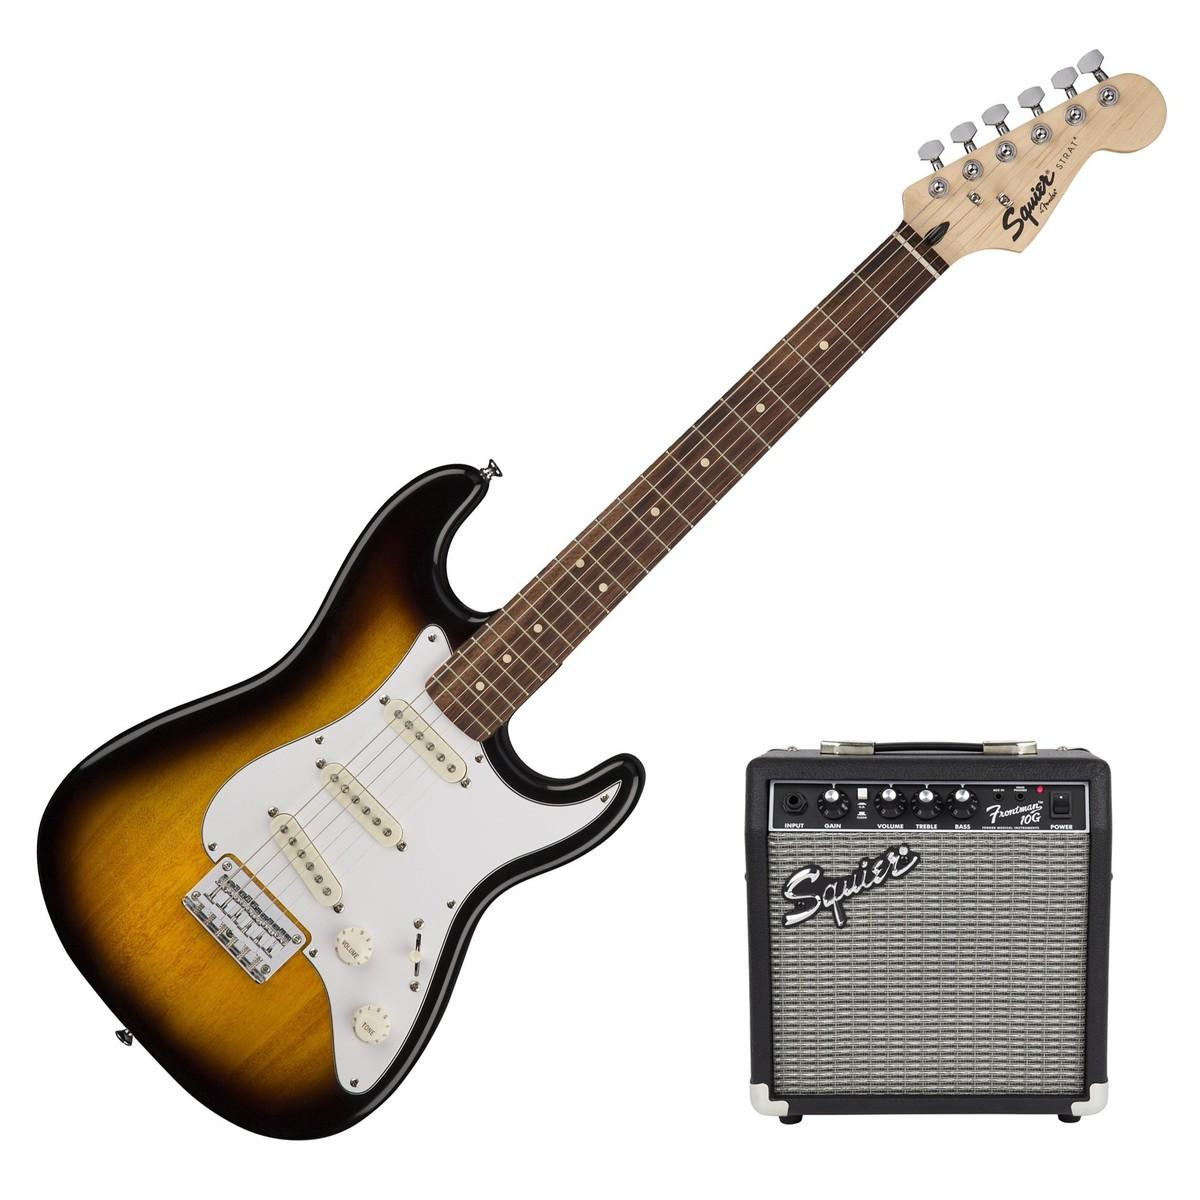 fender squier strat pack ss short scale electric guitar pack sunburst box opened at gear4music. Black Bedroom Furniture Sets. Home Design Ideas